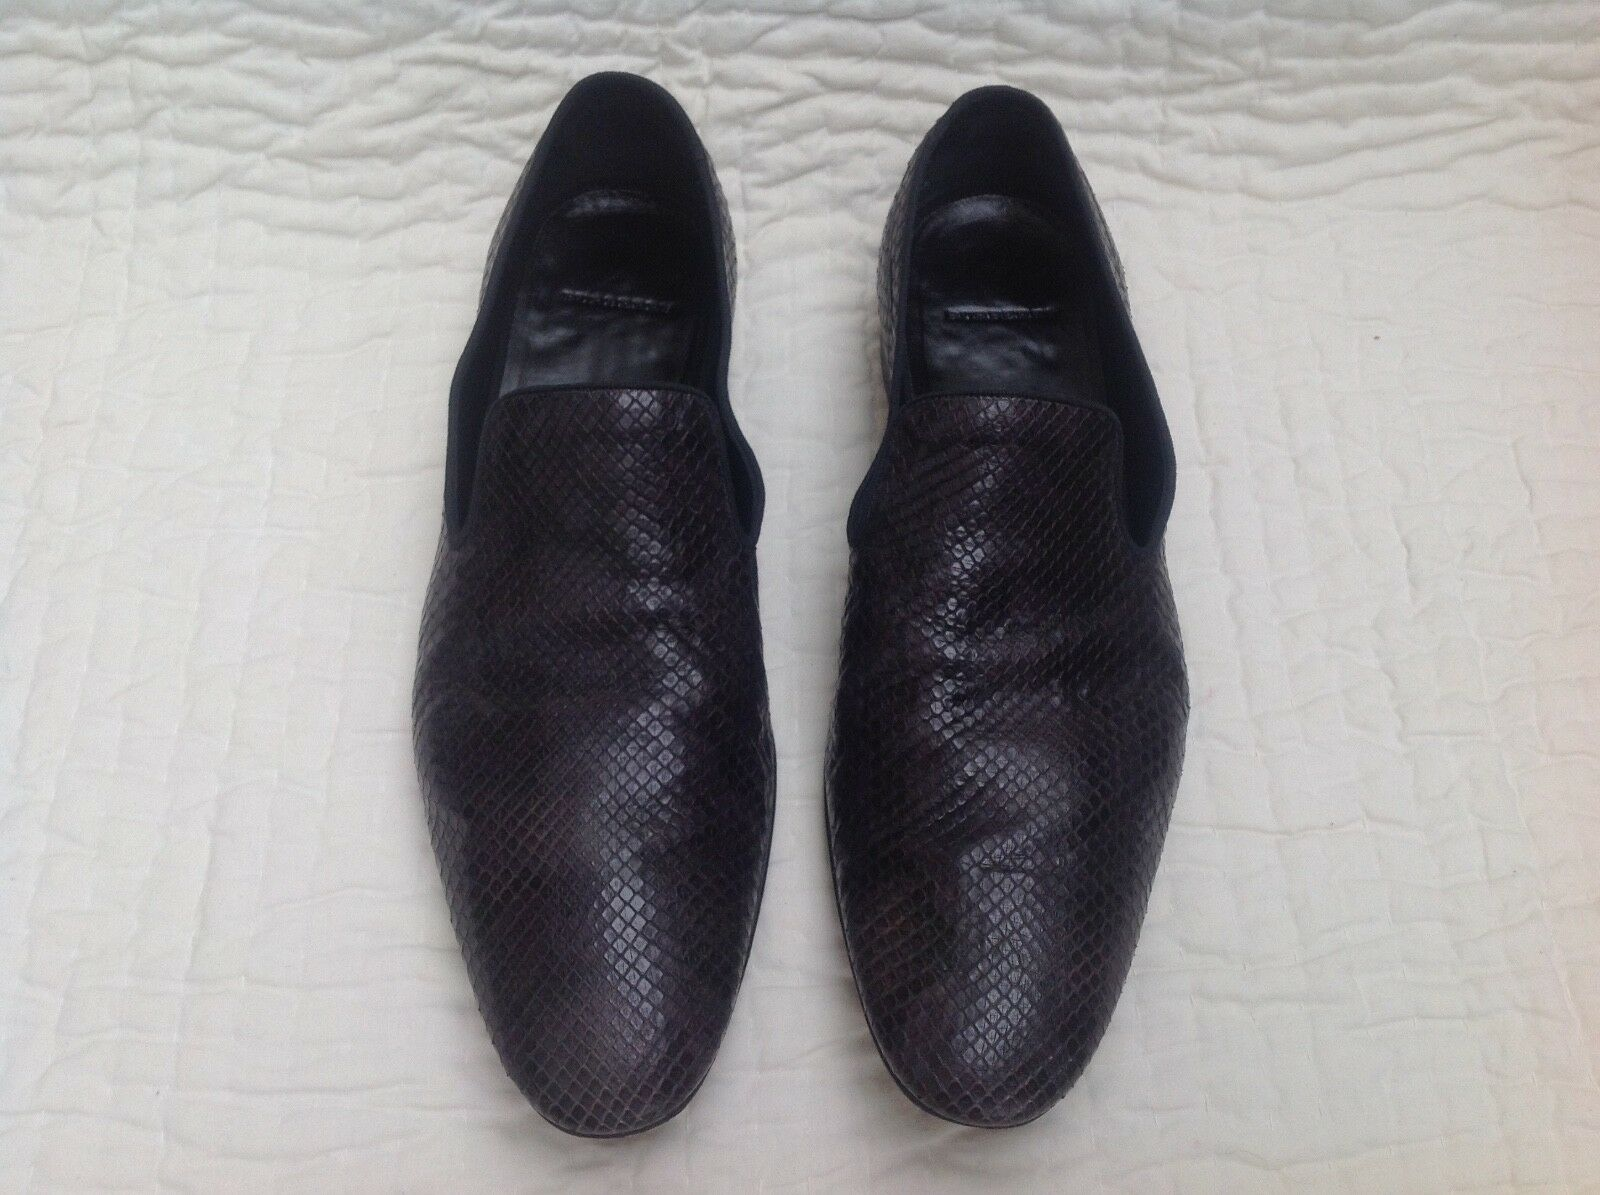 skin snake braun chocolate Python Burberry schuhe loafers 42